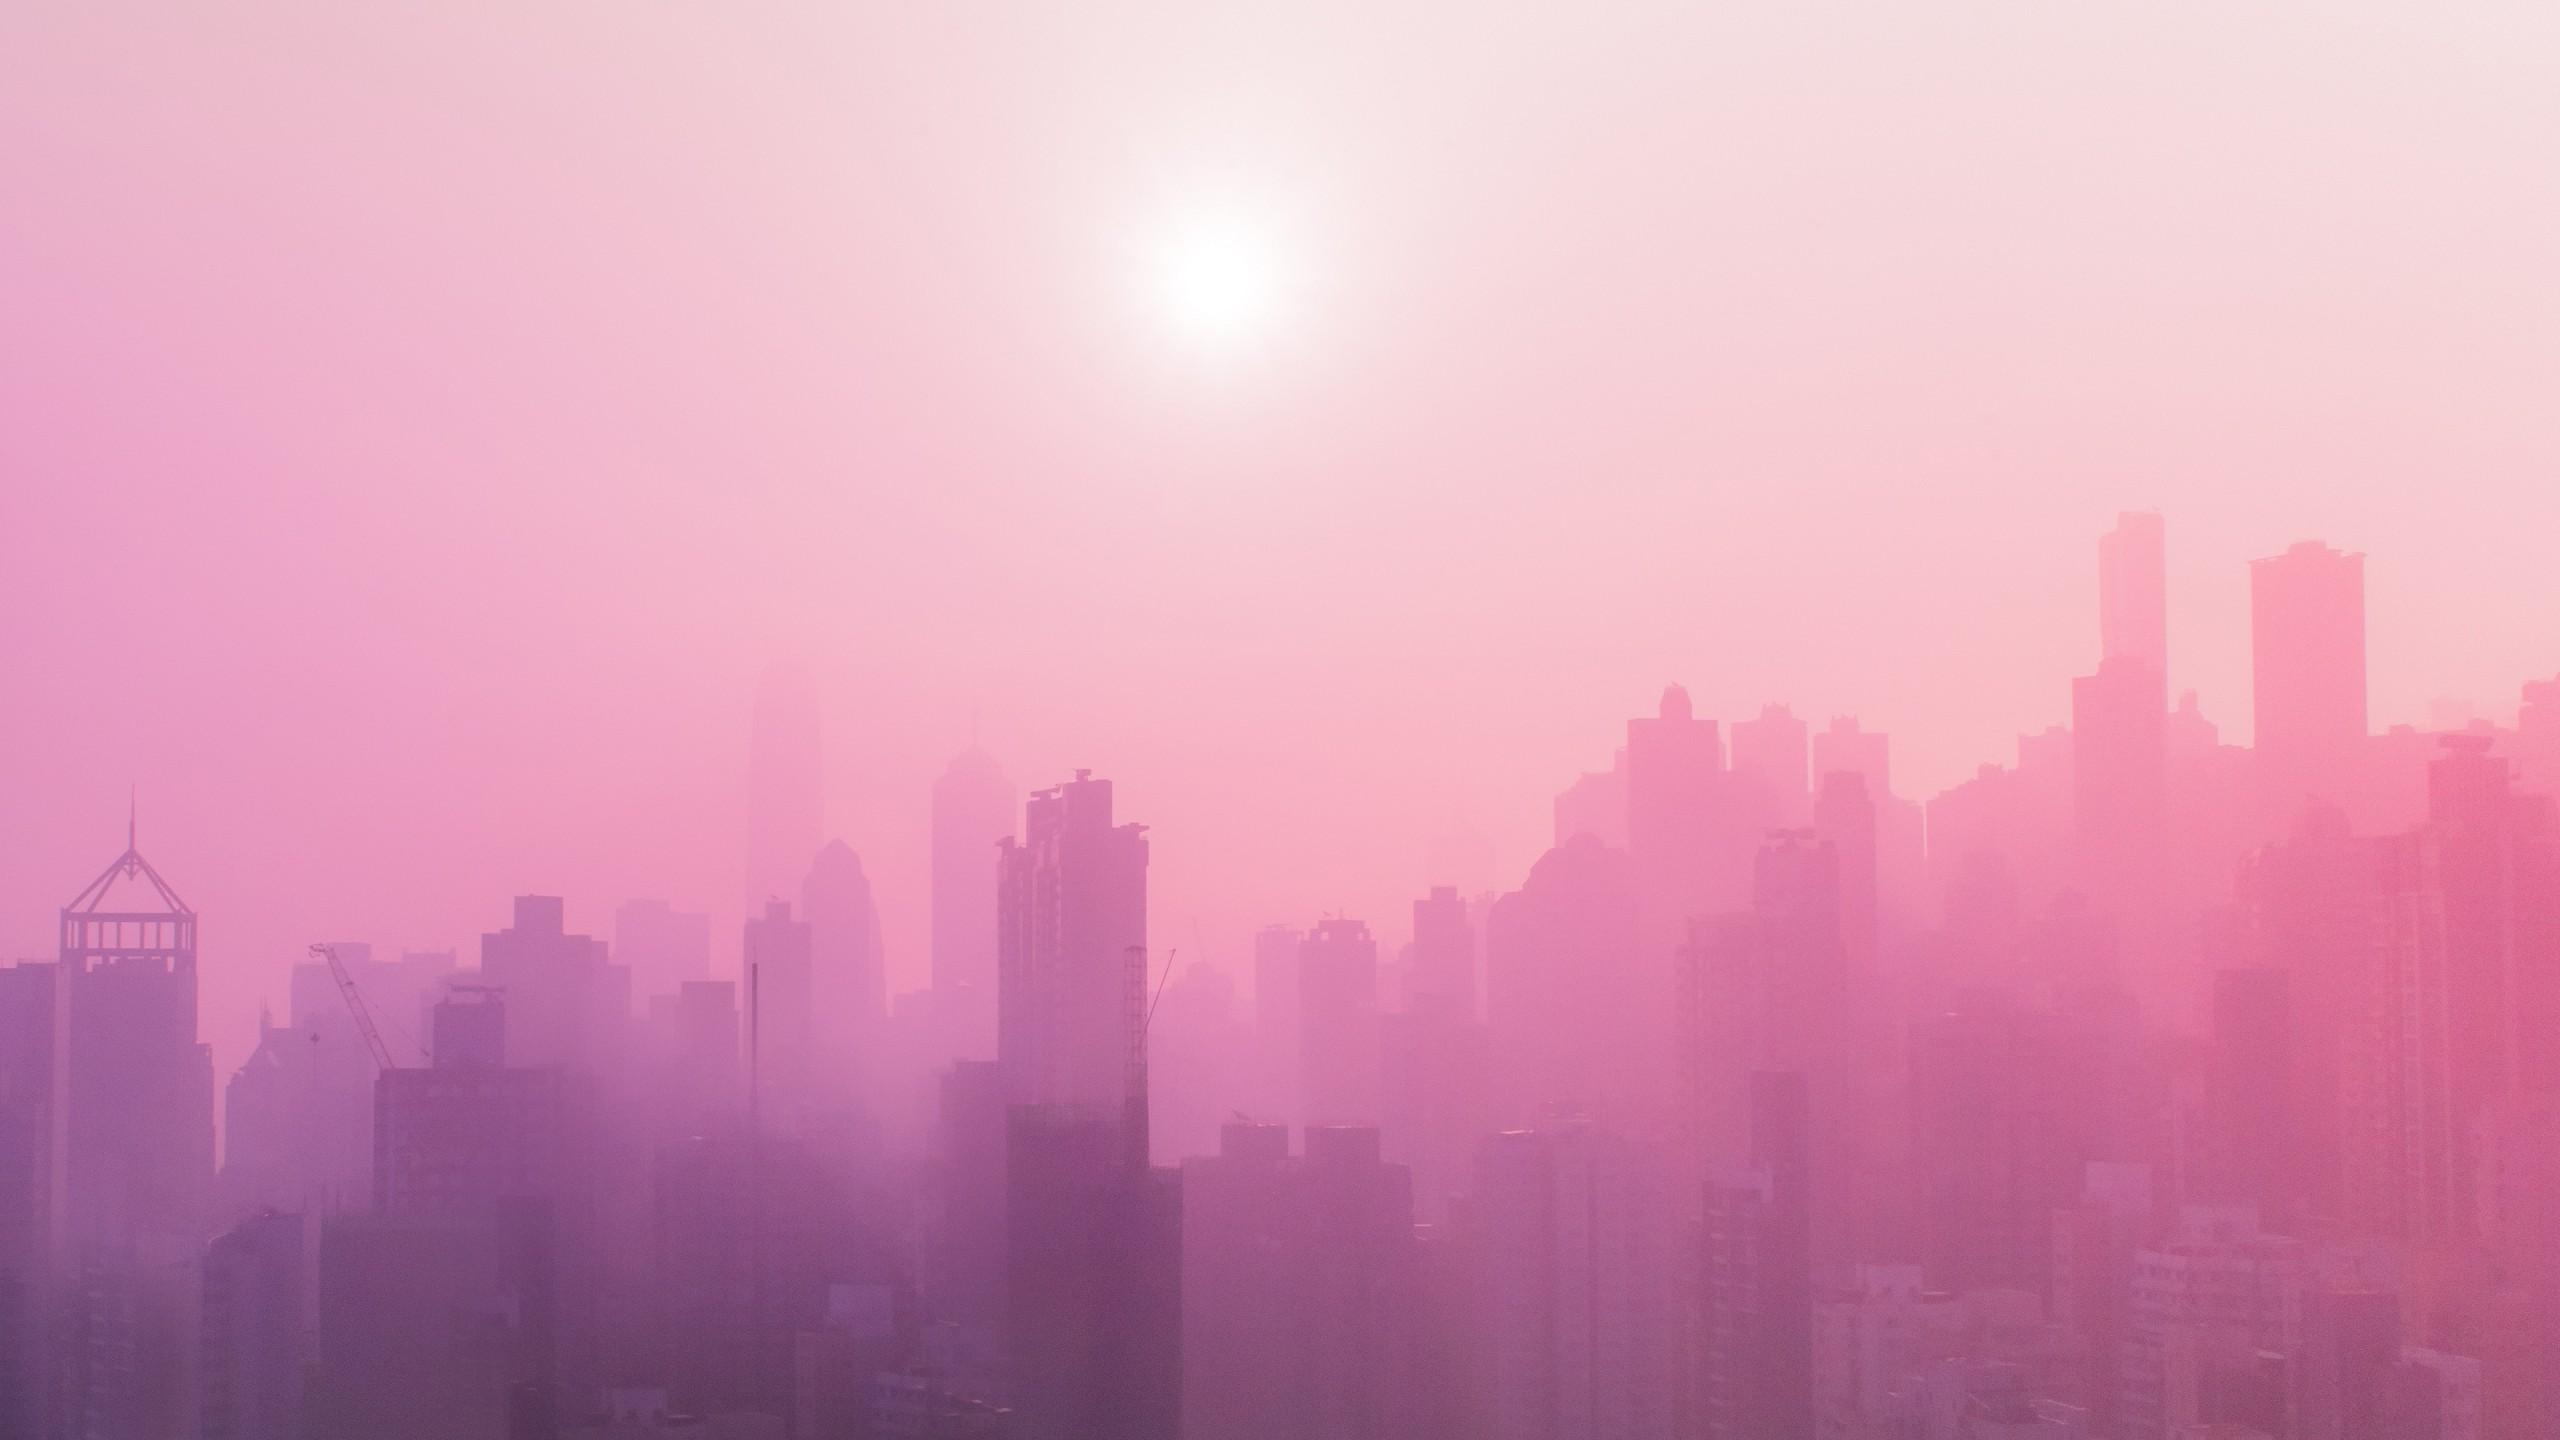 Pink Urban Skyscrapers 4K Wallpapers HD Wallpapers ID 23385